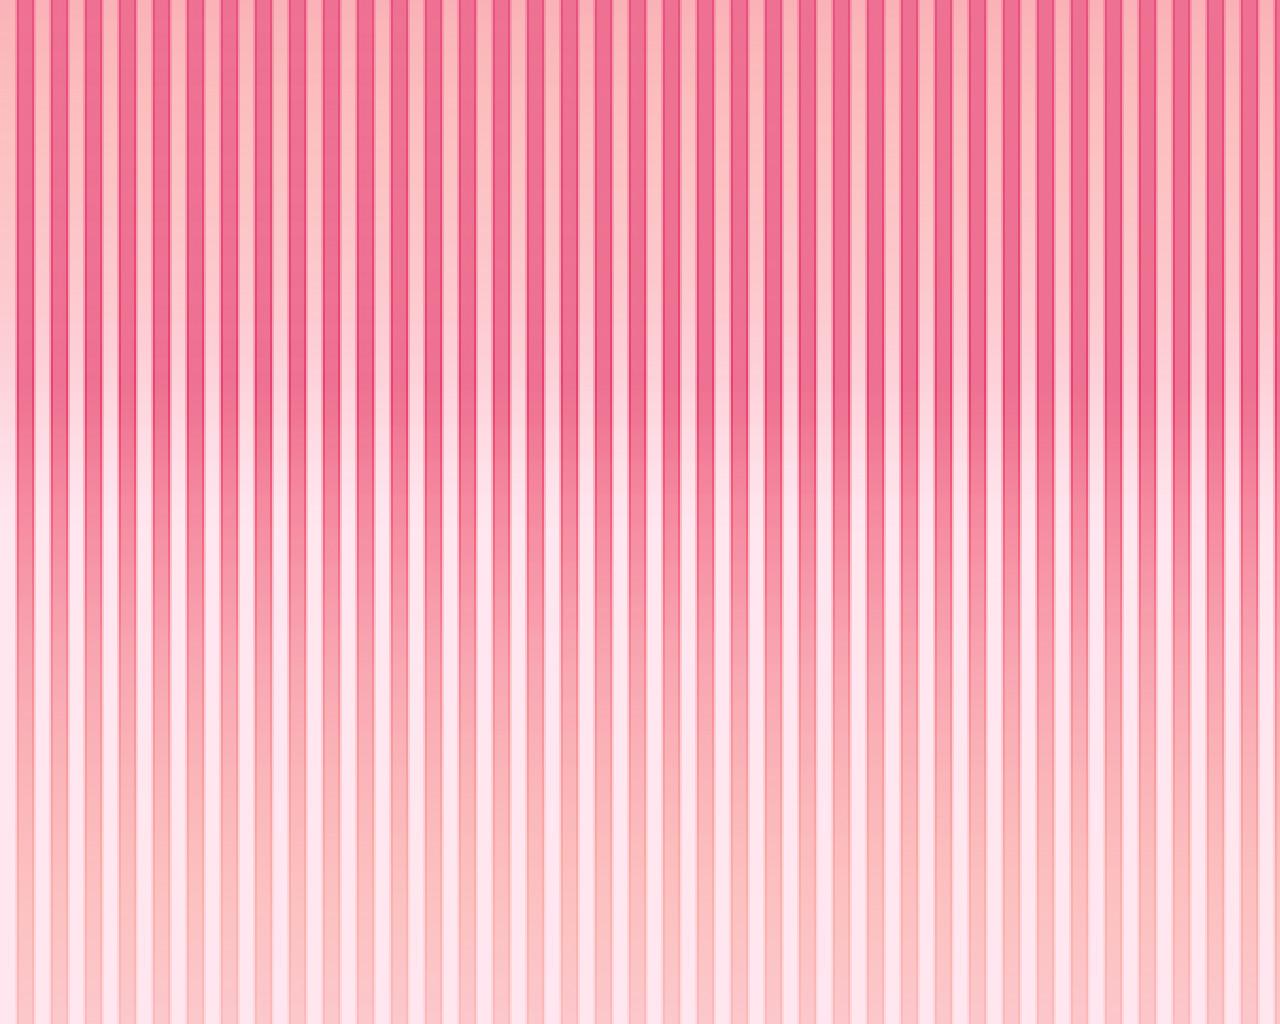 https://1.bp.blogspot.com/-neYWpPEbEOw/UgyxlN5jOTI/AAAAAAAAB9M/CV4nSDHGh5k/s1600/Stripe+Wallpaper+-+Pink+\u0026+Peach+Colour+3.jpg